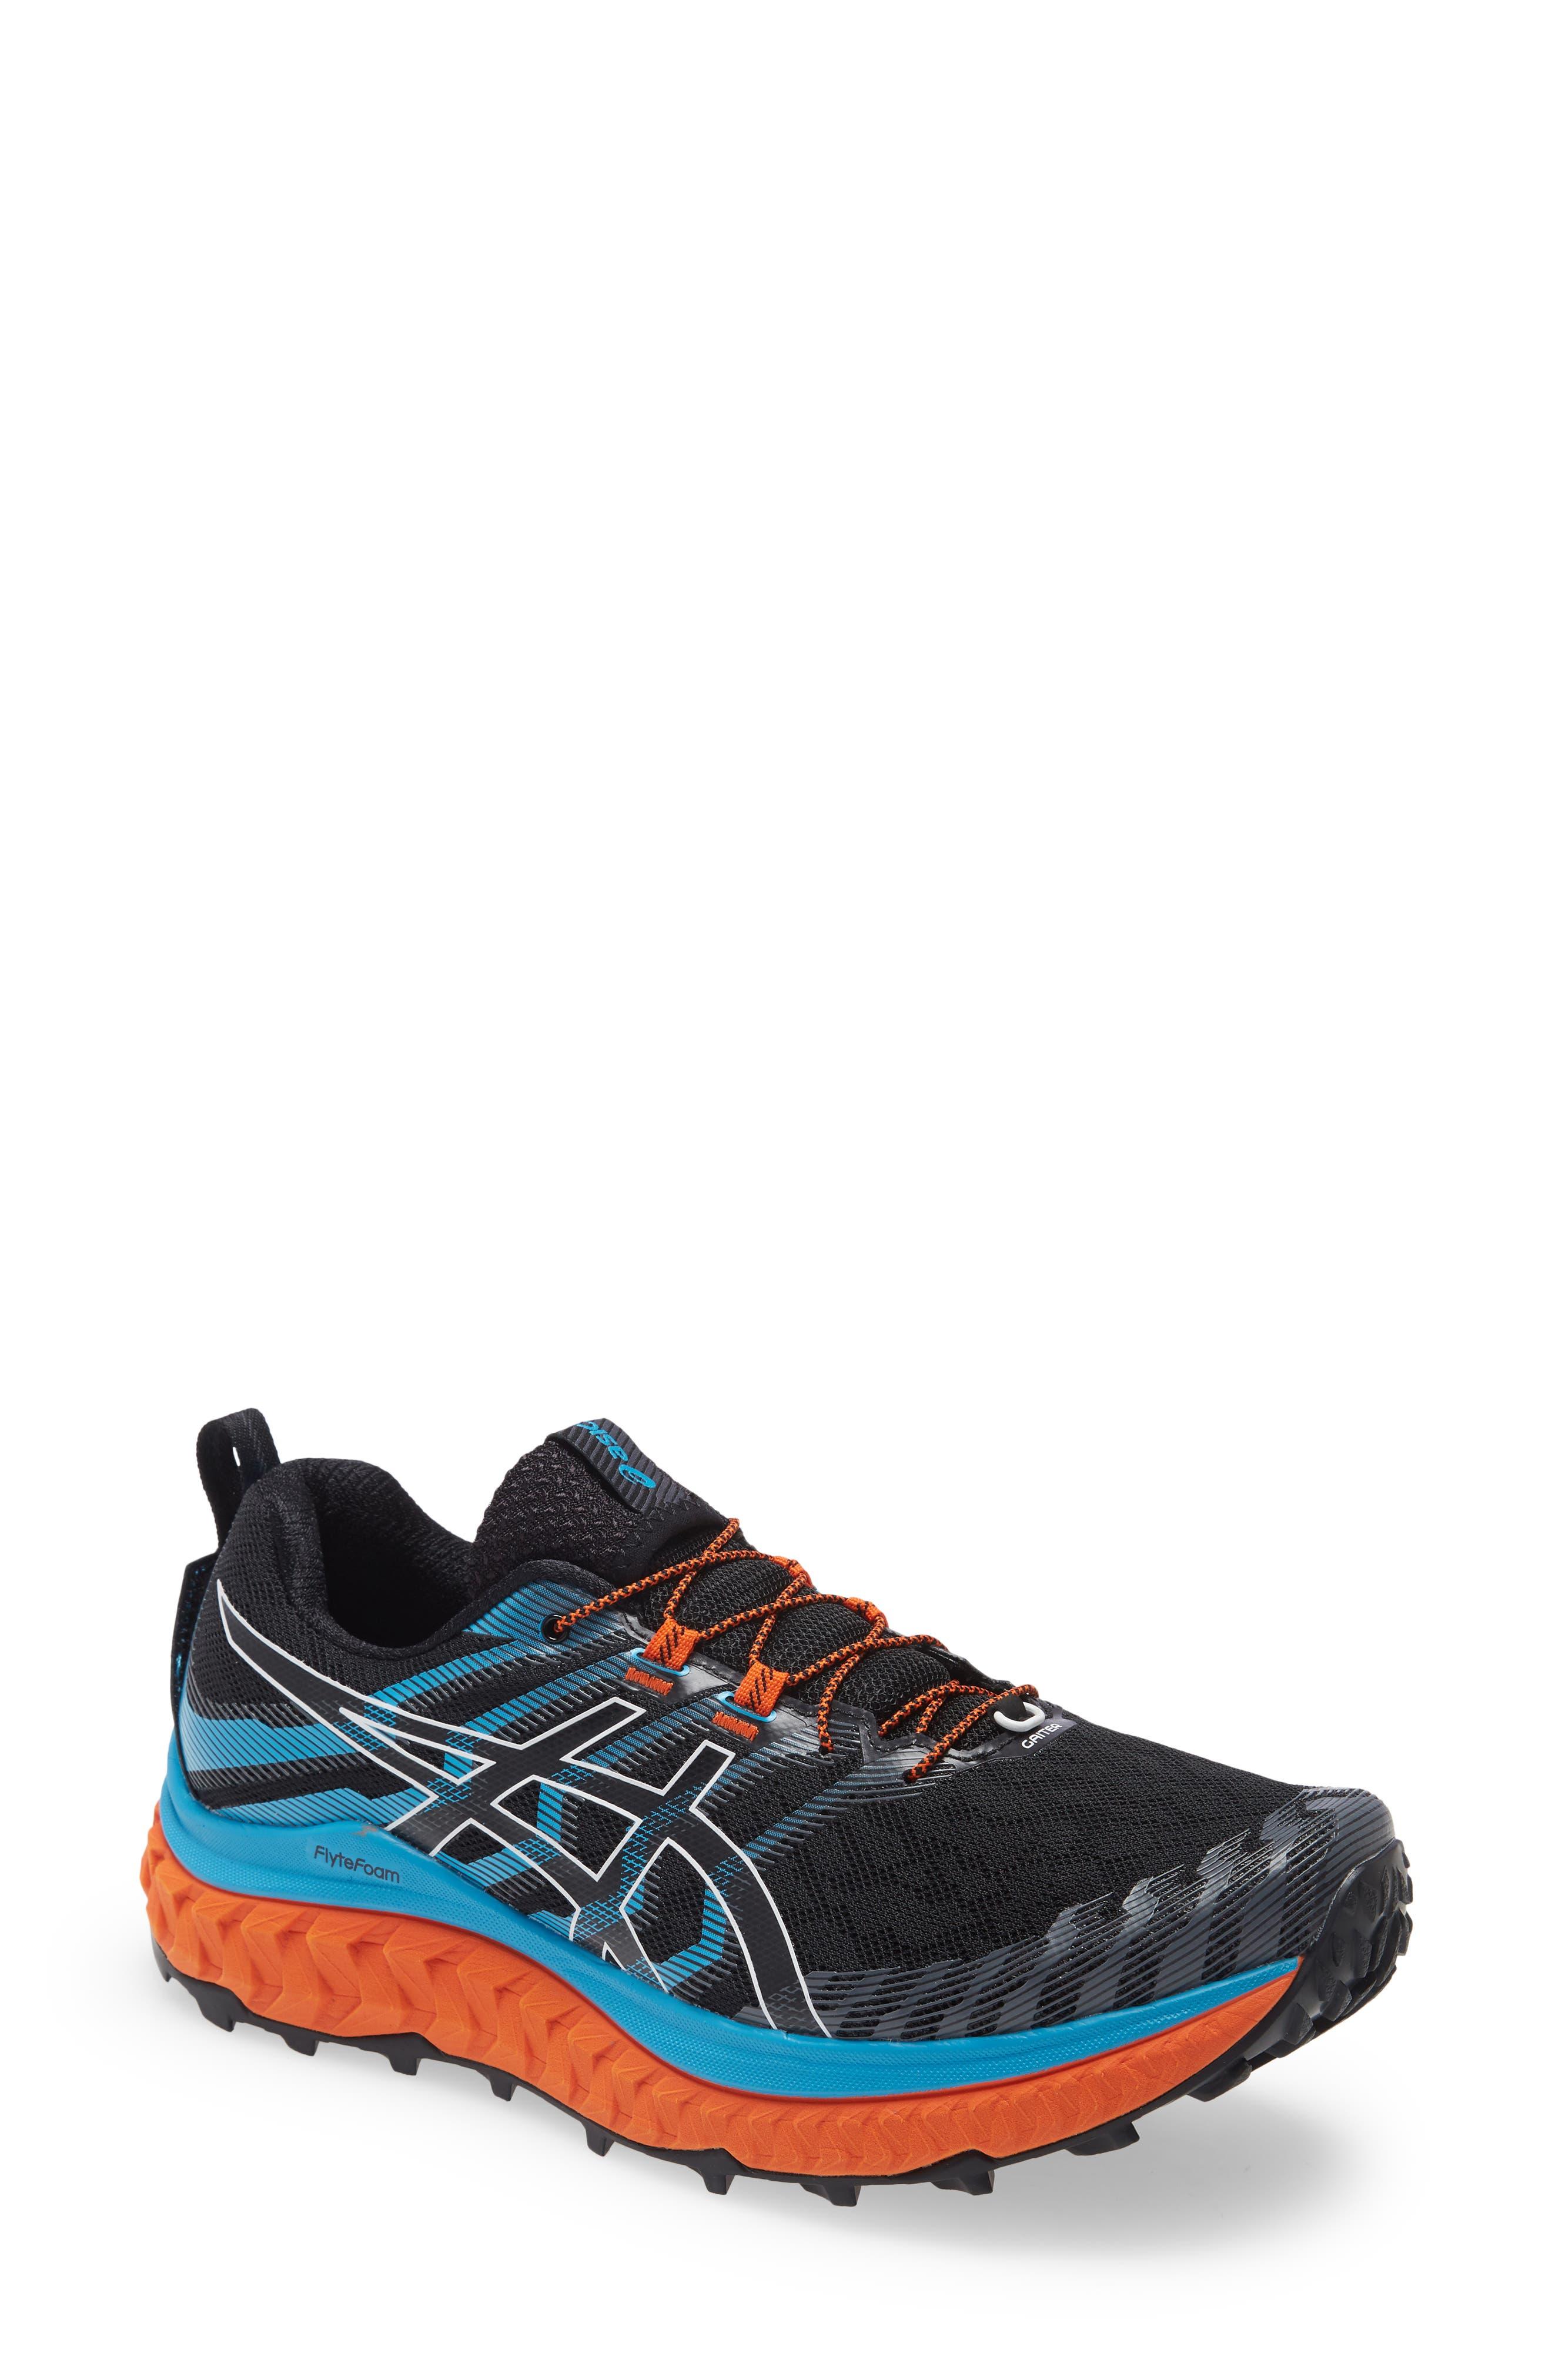 Men's Asics Trabuco Max Trail Running Shoe